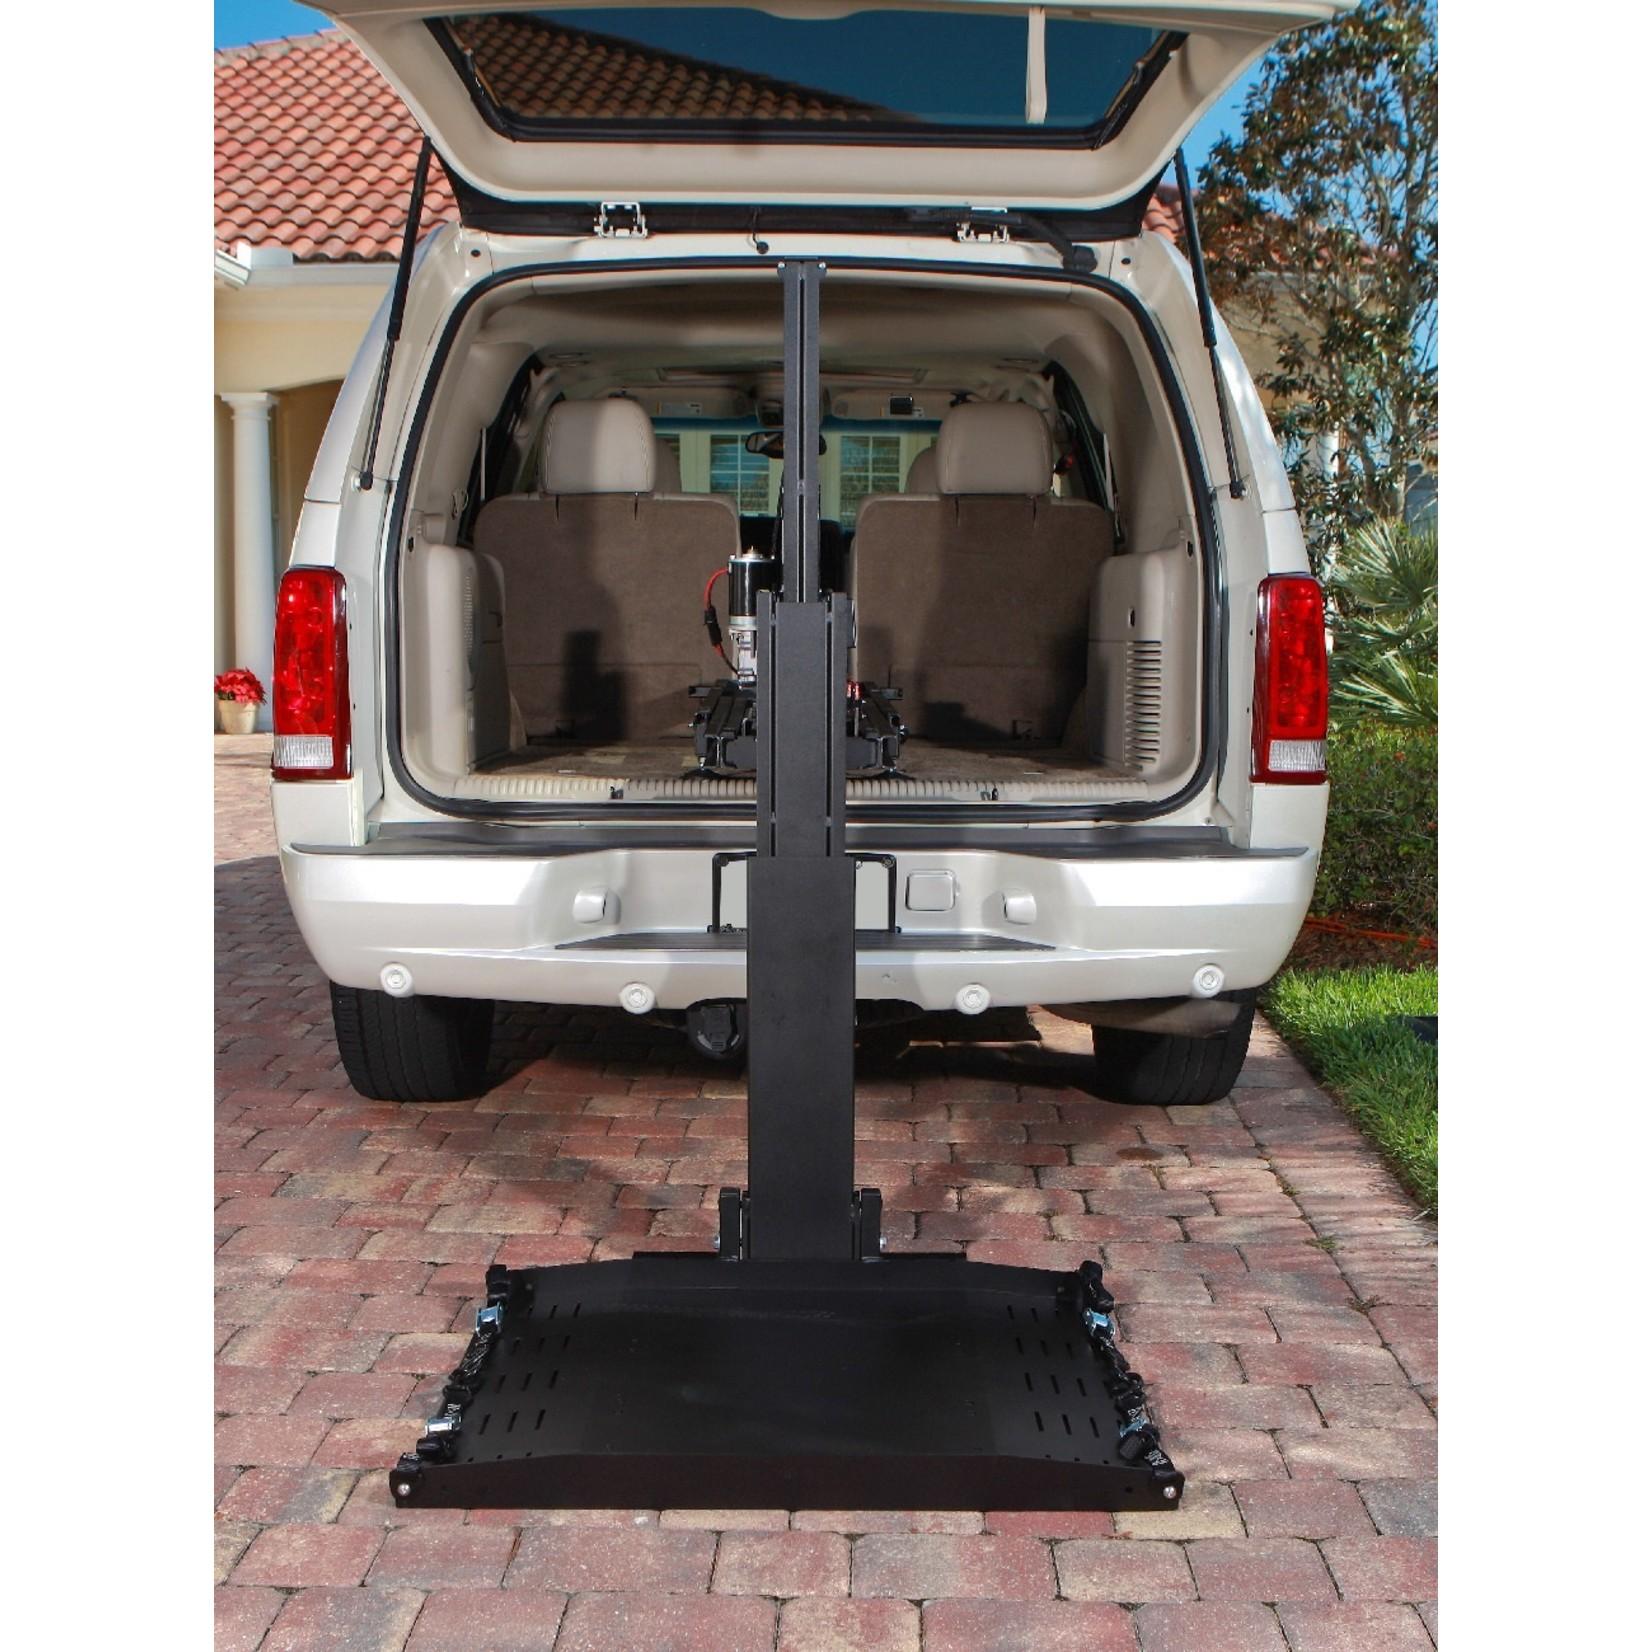 Harmar Mobility AL600 Hybrid Platform Lift